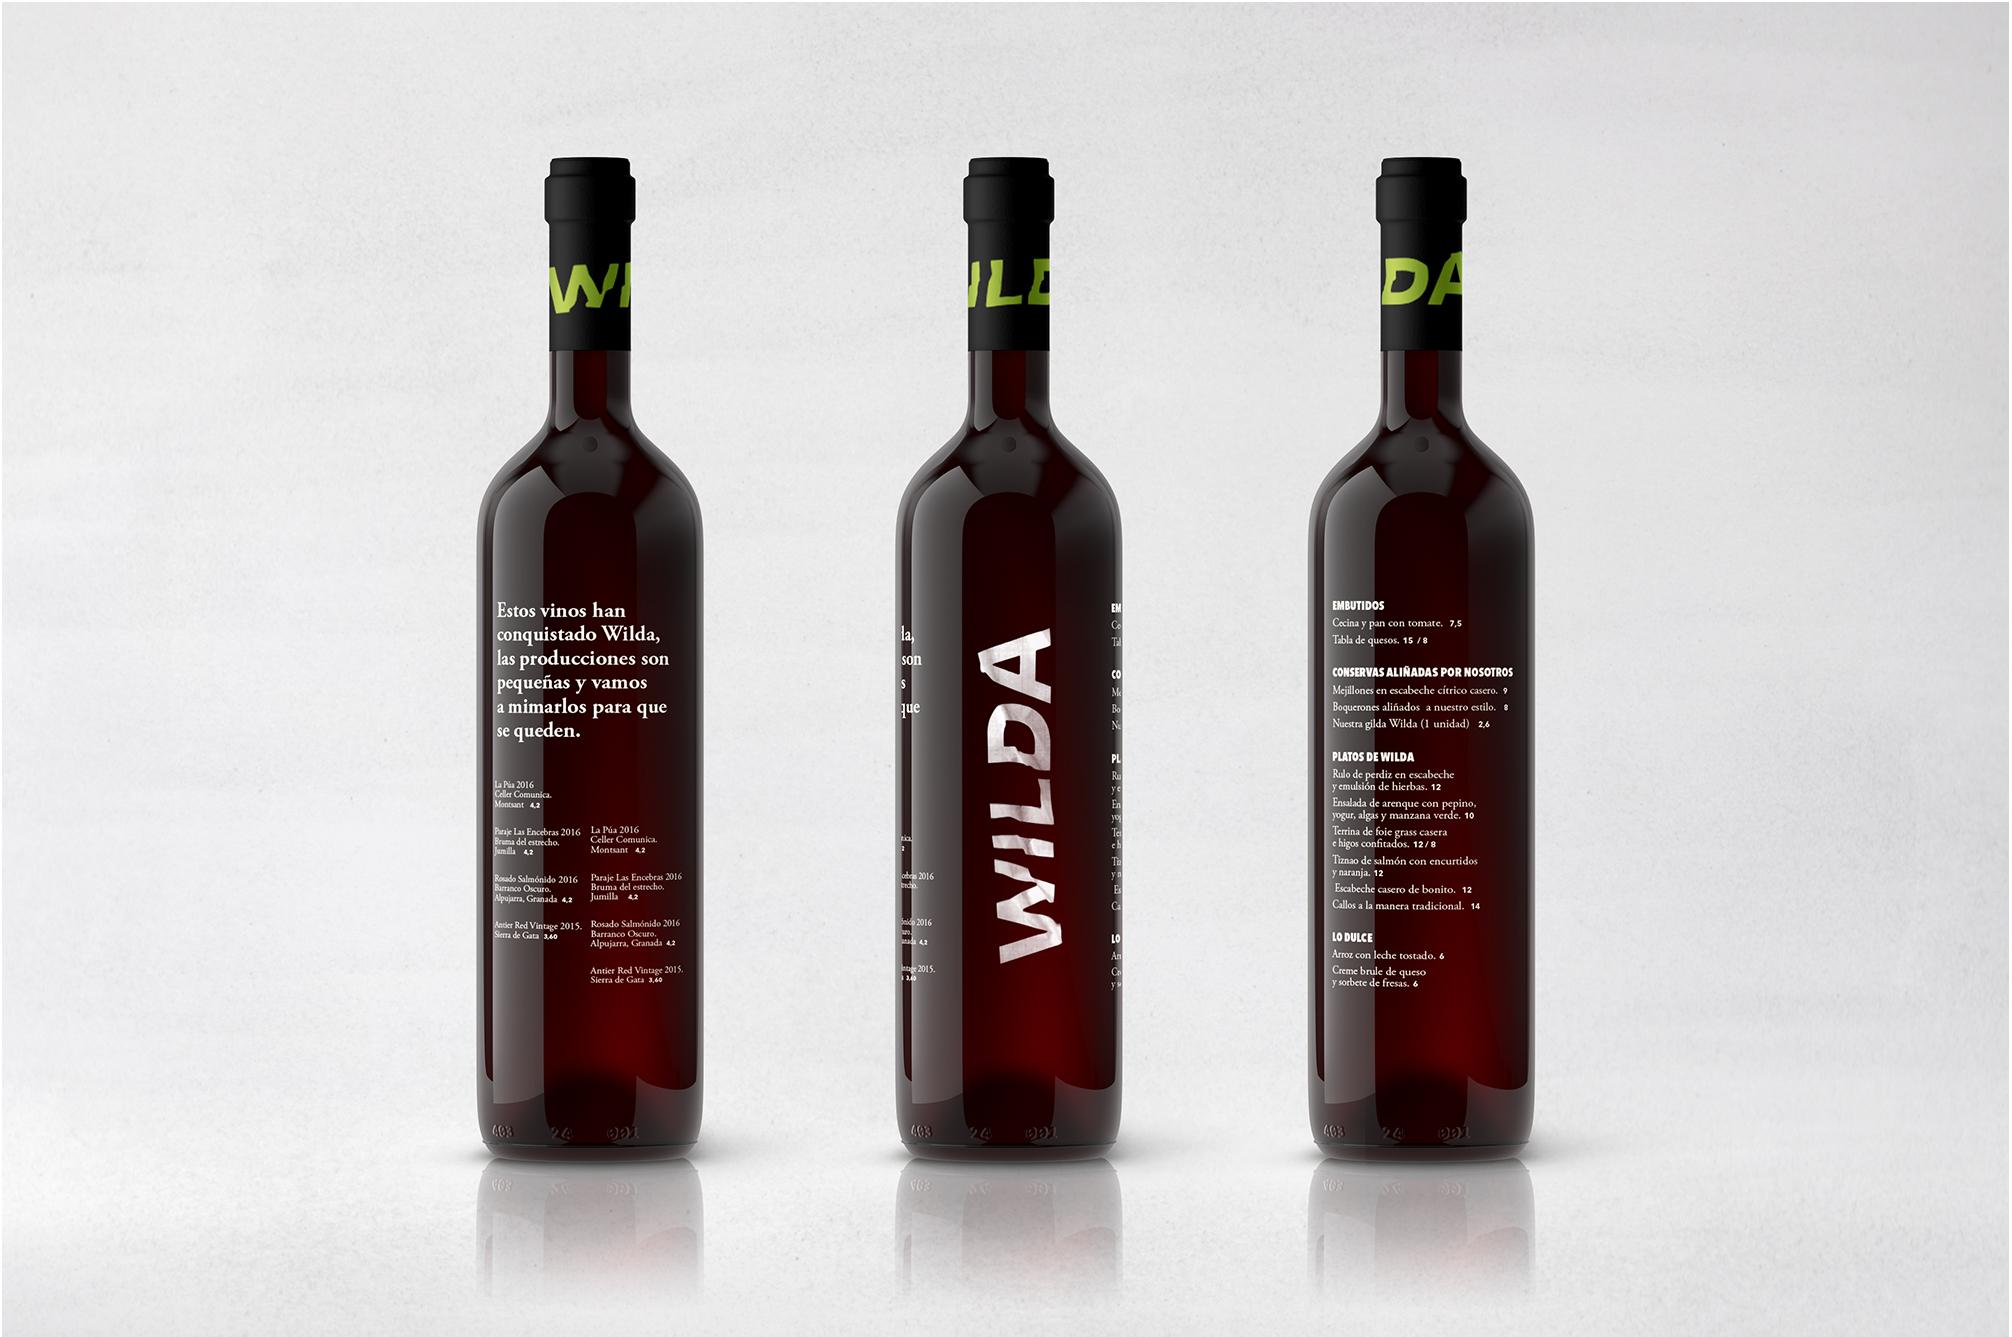 Wilda-ANGEL-ESPINOSA-09